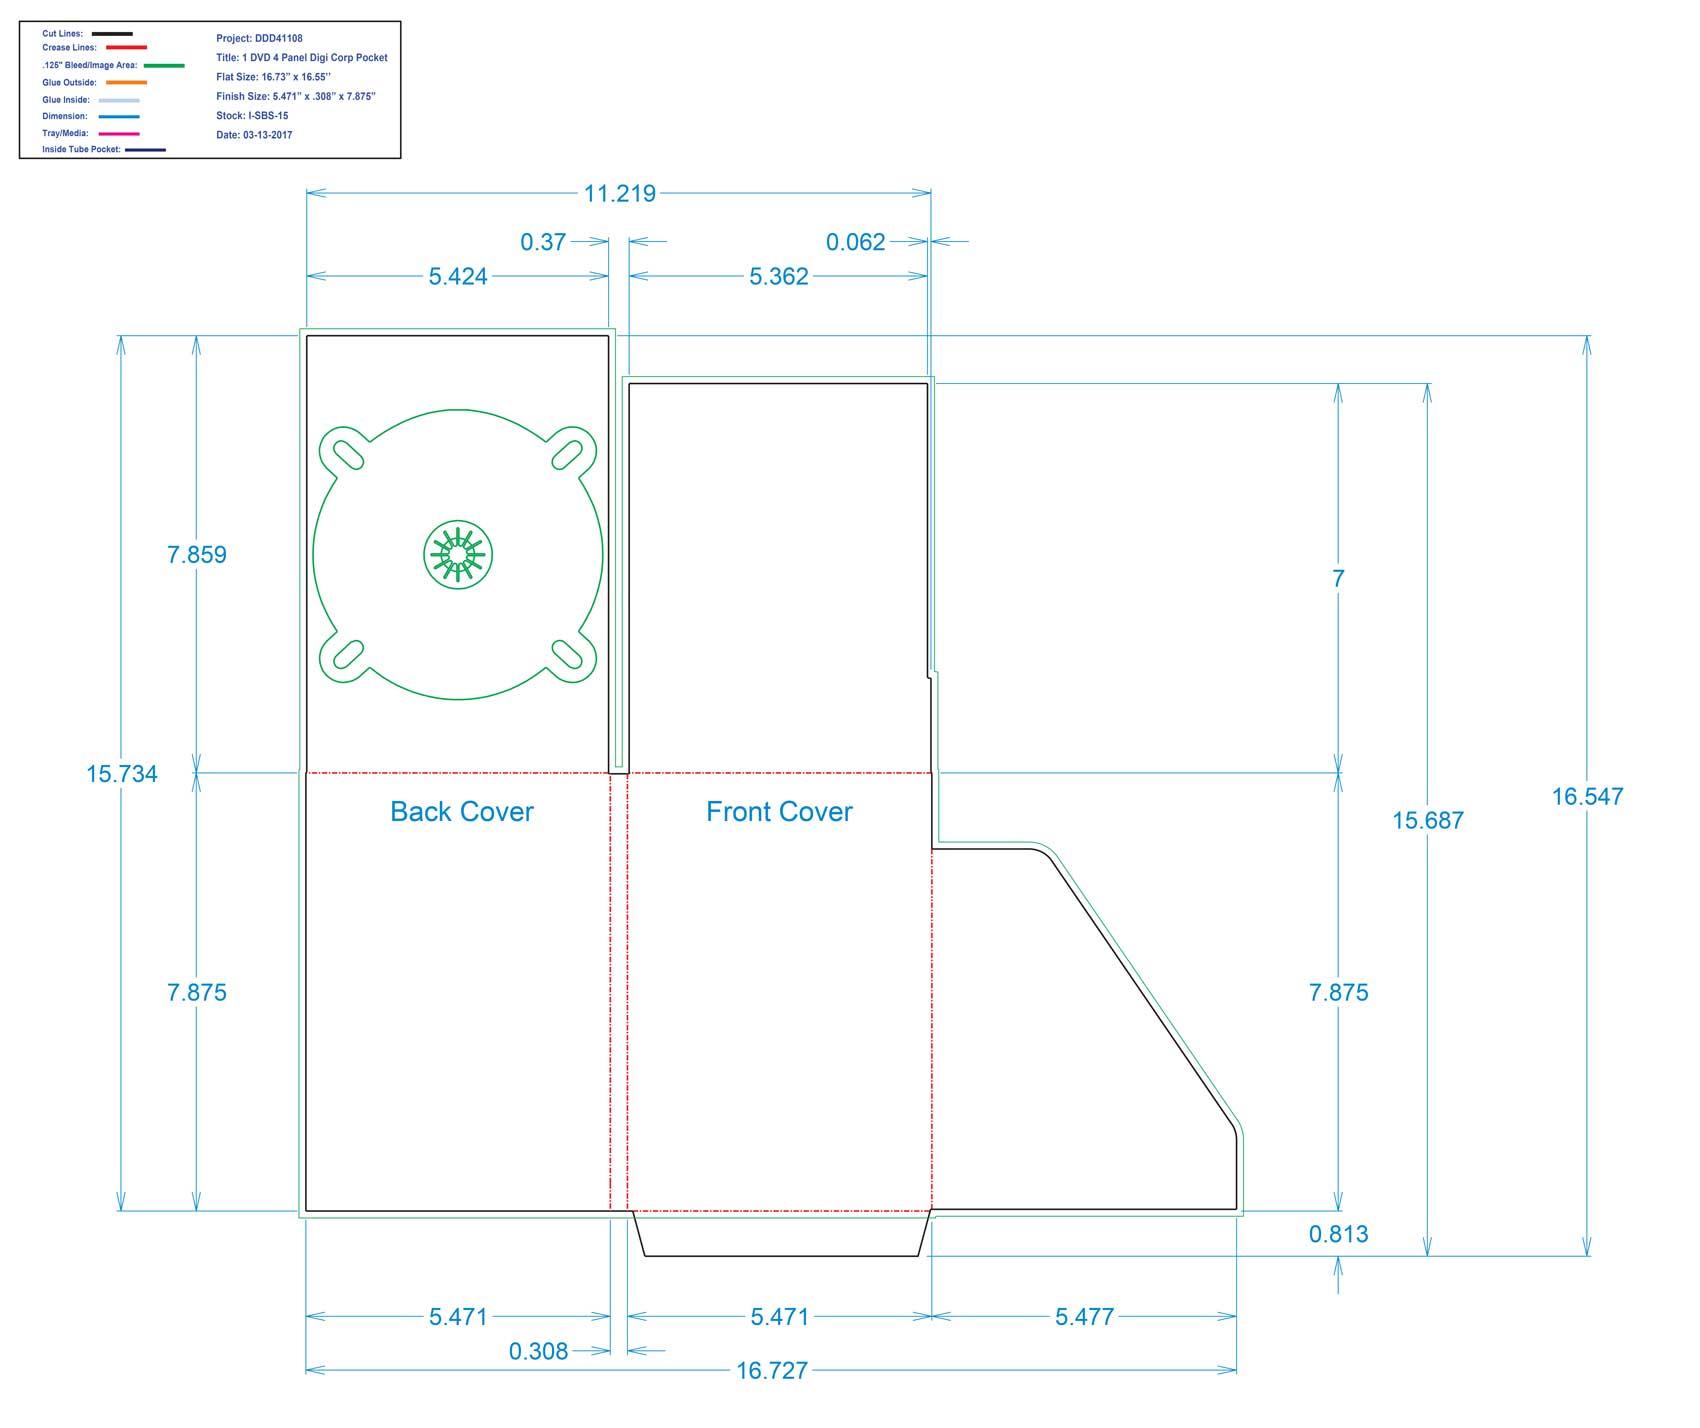 DDD41108 - 4 Panel One Tray Corp Pocket Oversize